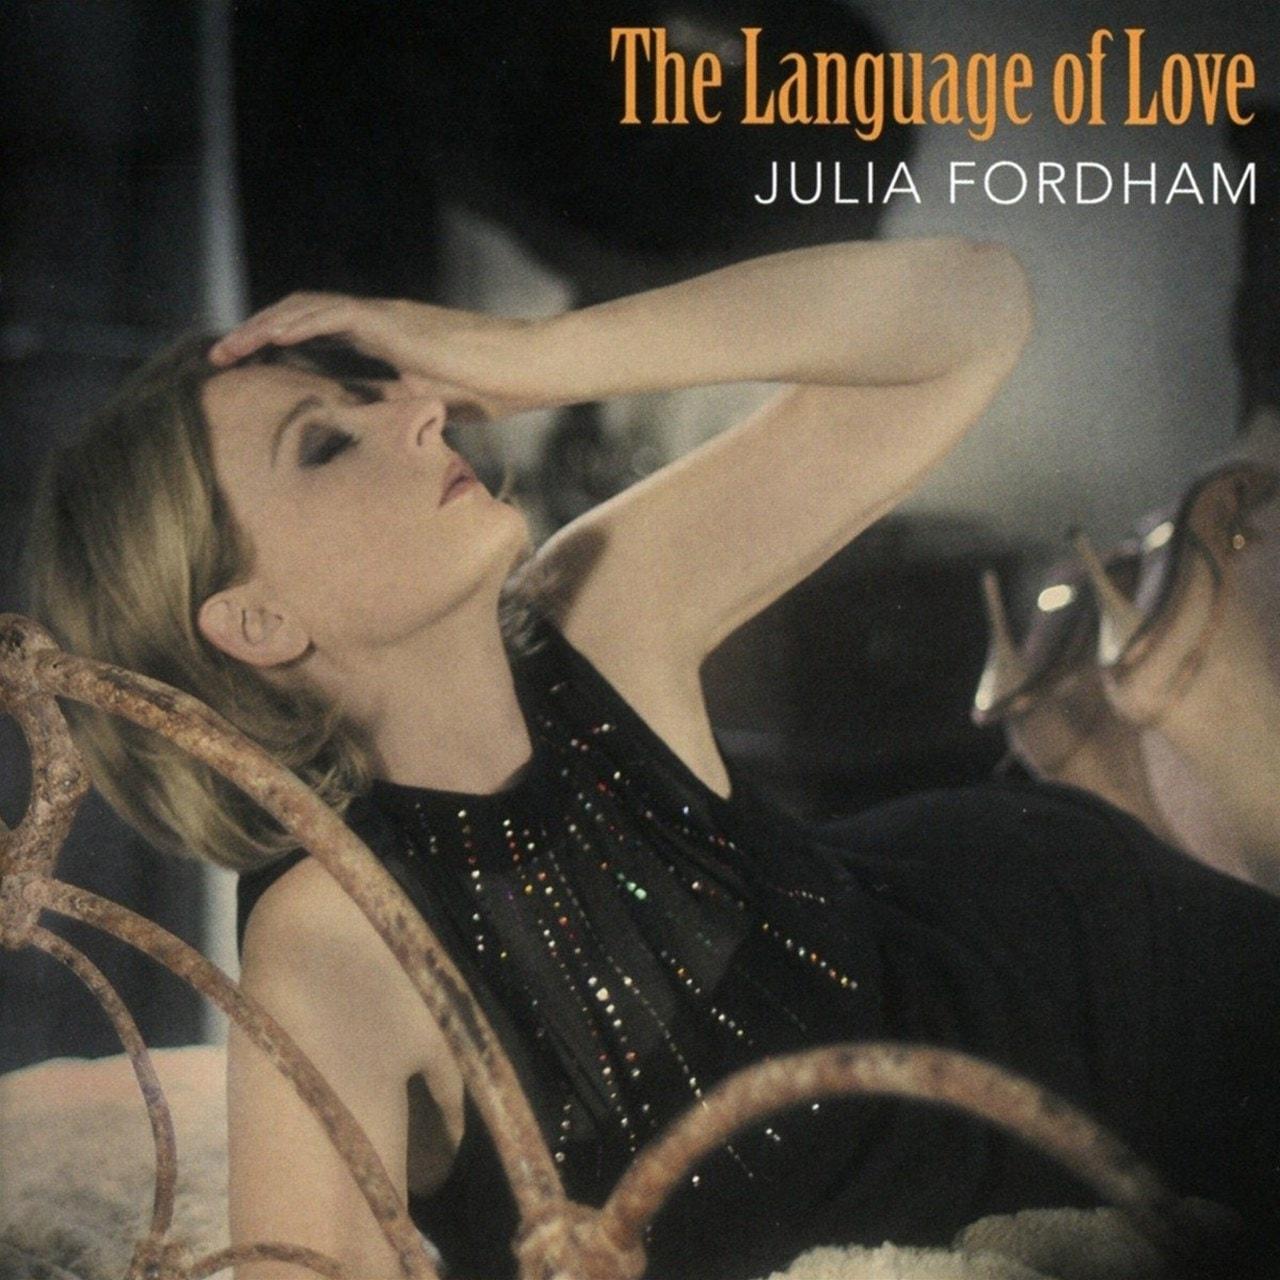 The Language of Love - 1